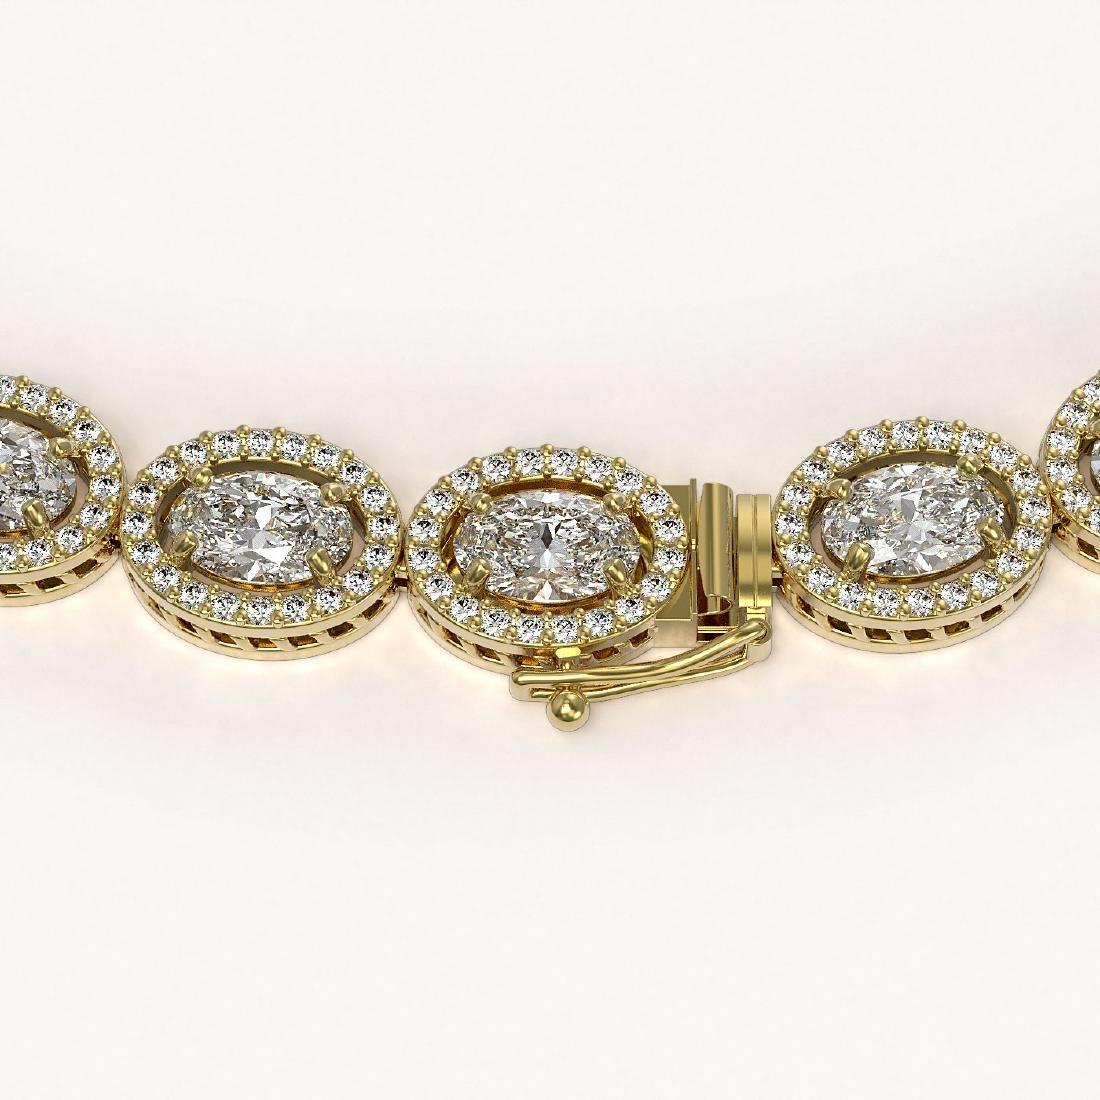 34.96 CTW Oval Diamond Designer Necklace 18K Yellow - 2